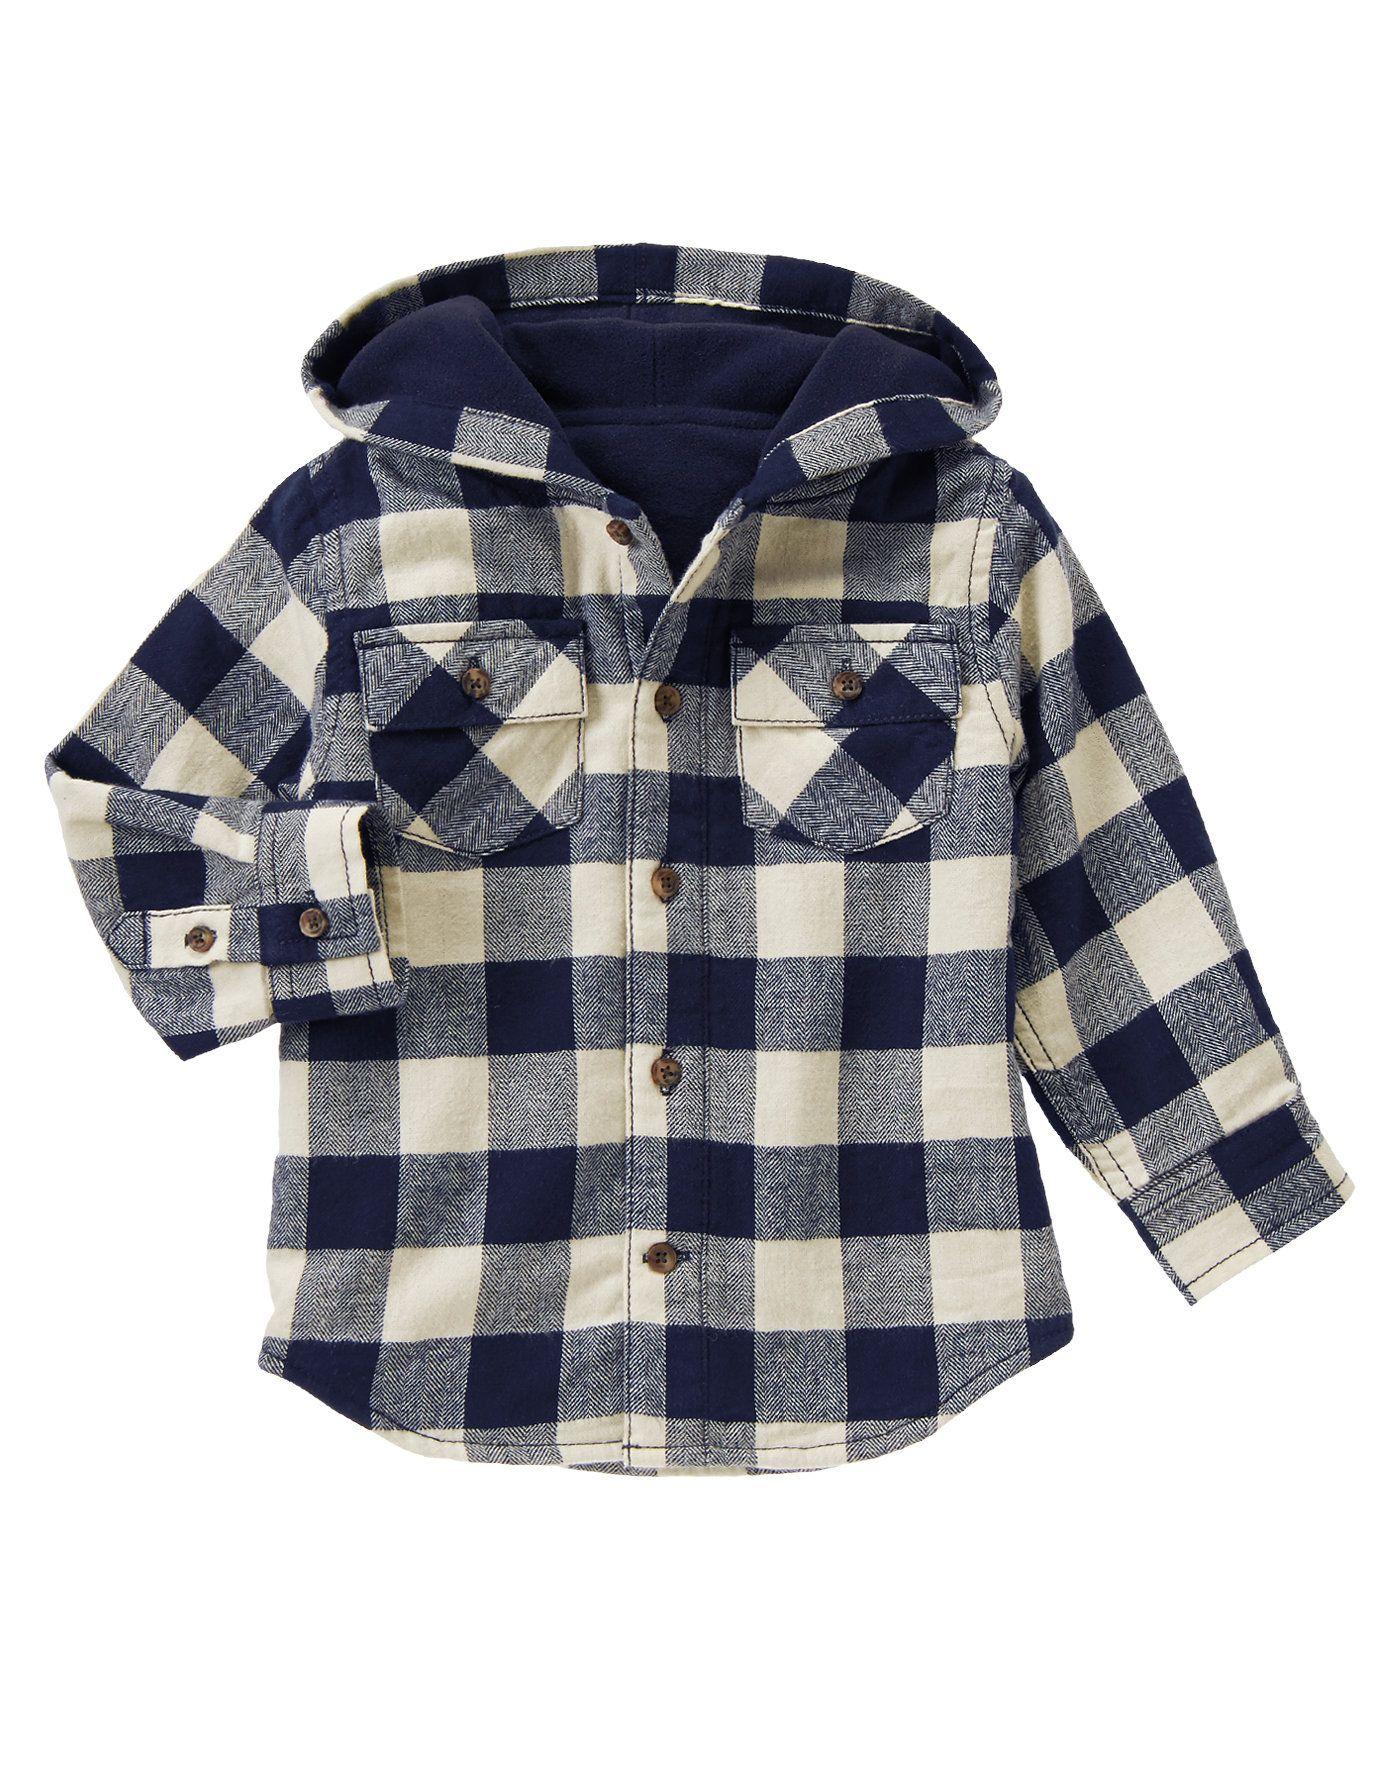 f2fb7bab1 fleece lined | Dress my Kids (boys) | Toddler outfits, Shirt jacket ...